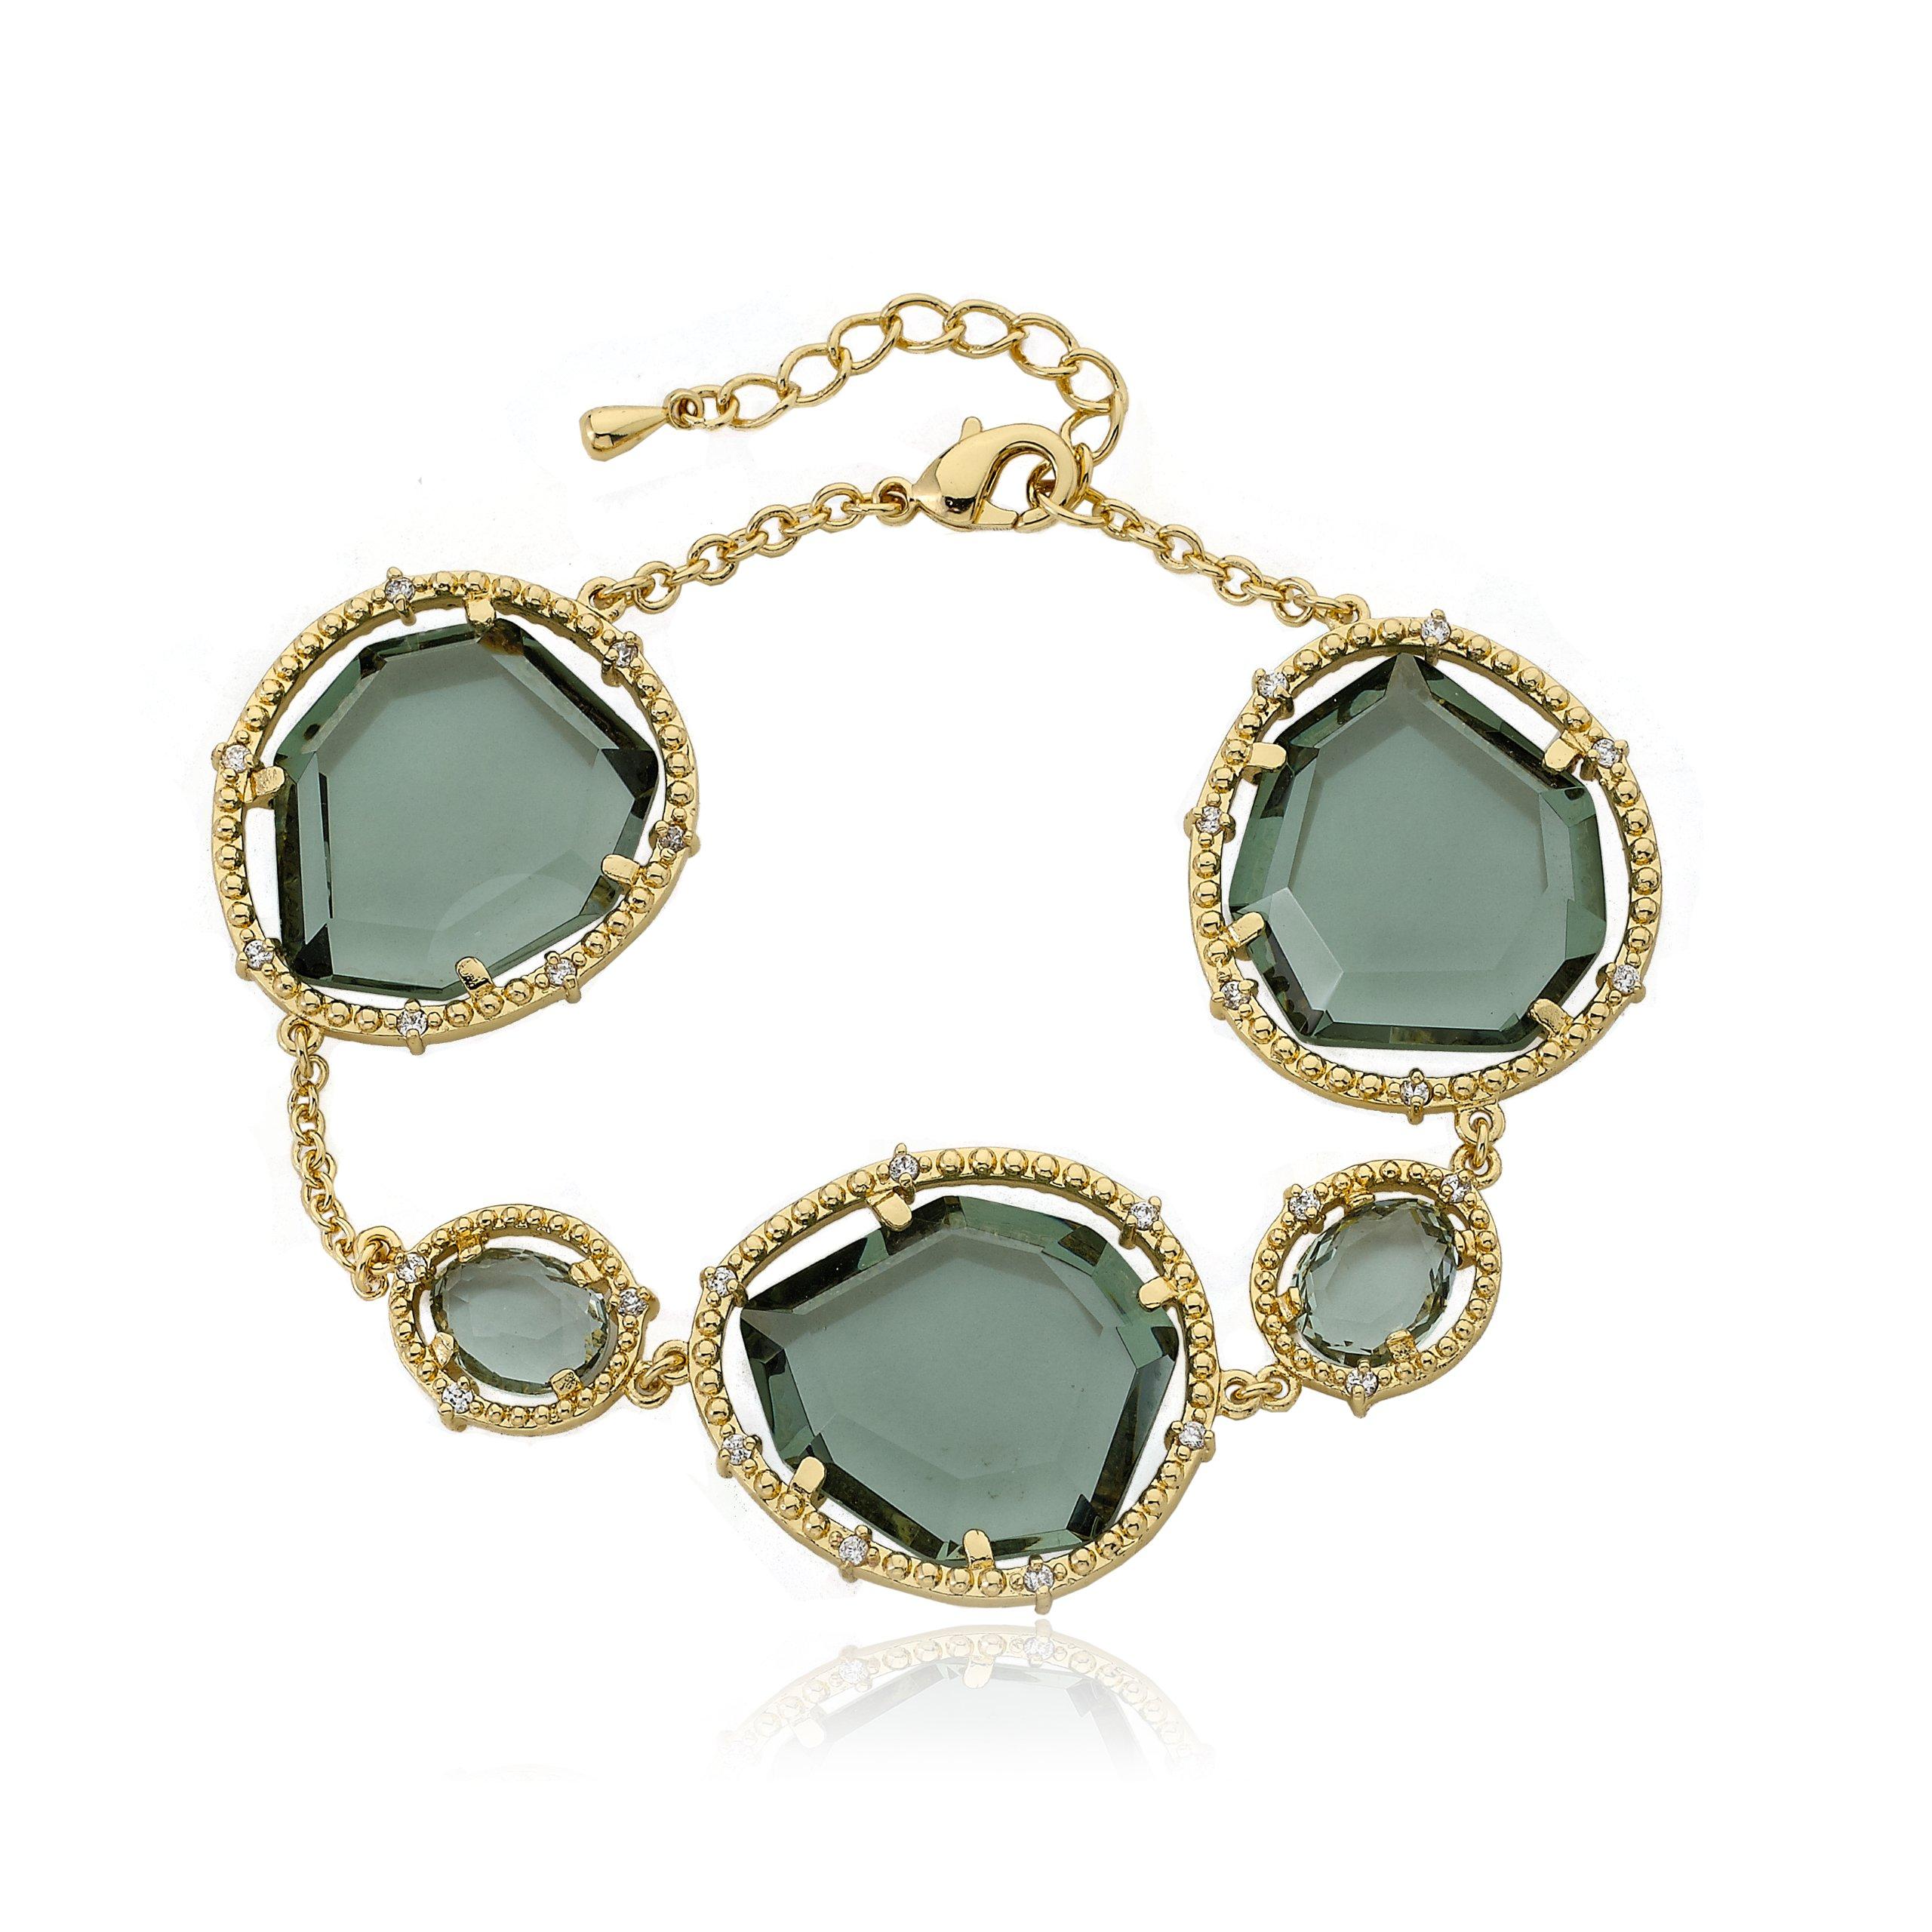 Riccova Sliced Glass 14k Gold-Plated Black Sliced Glass Chain Bracelet